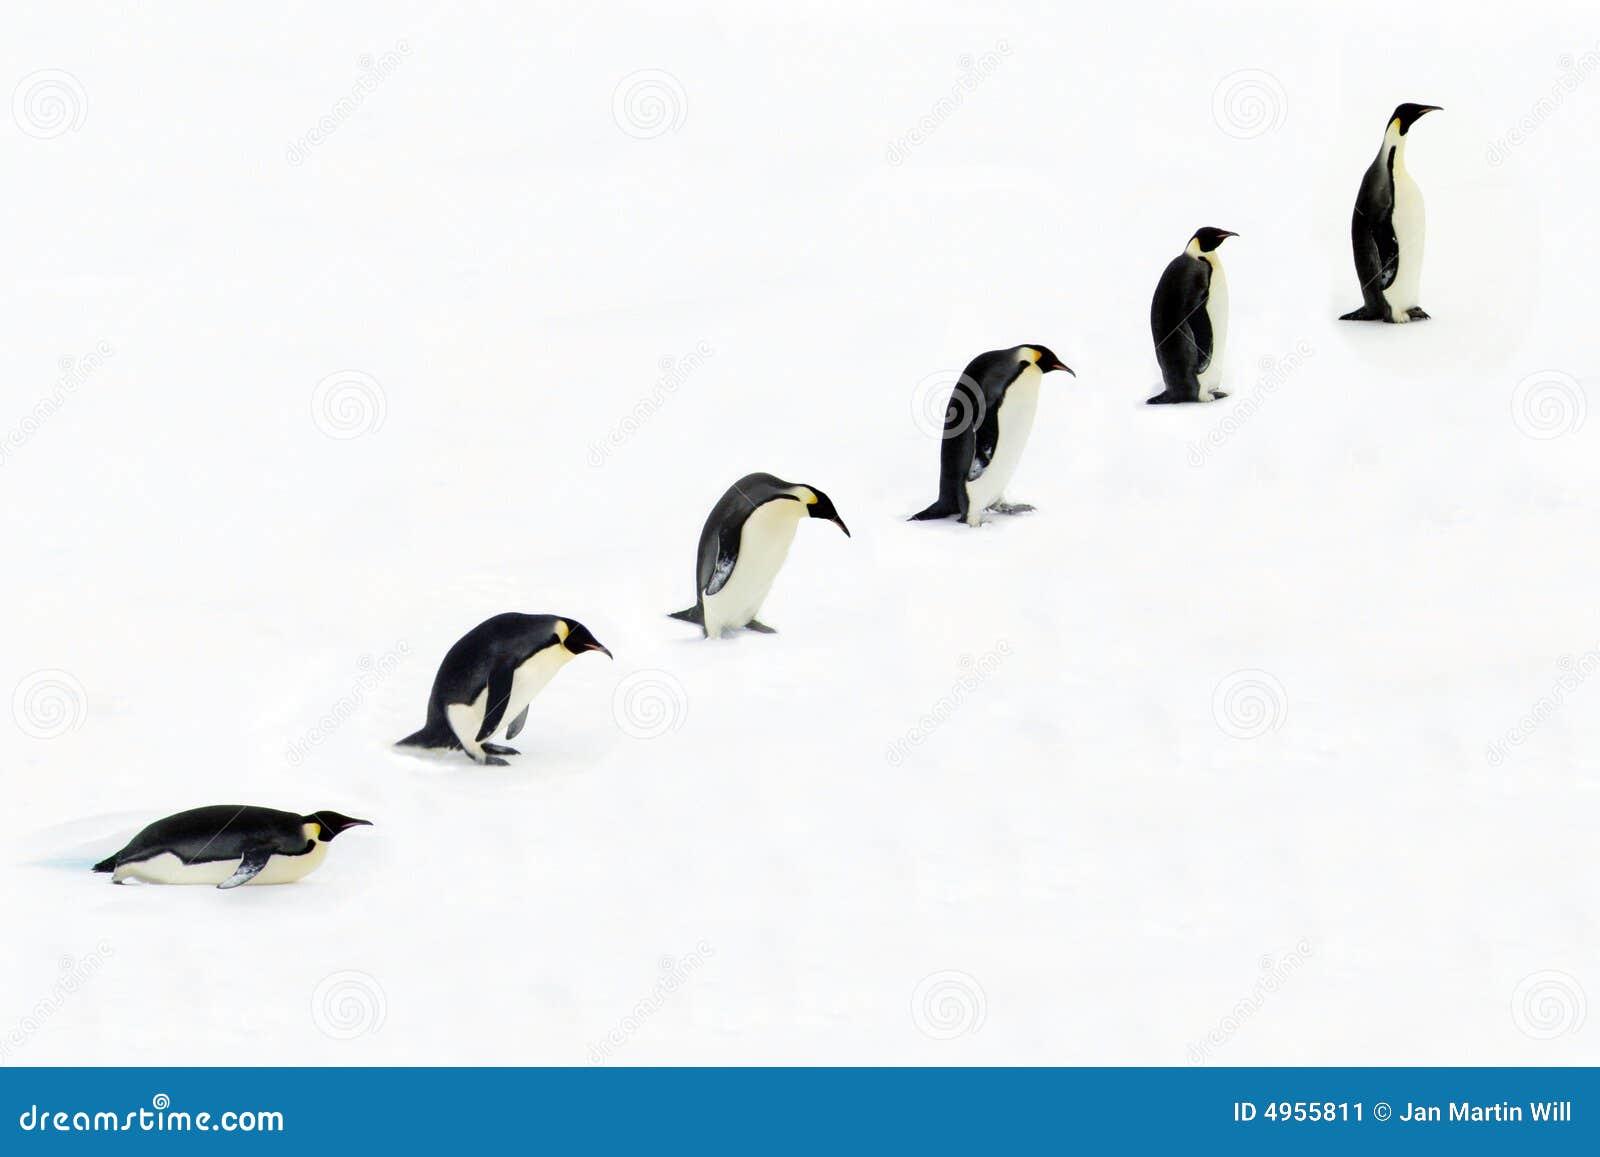 Evolution Of A Penguin Stock Image - Image: 4955811